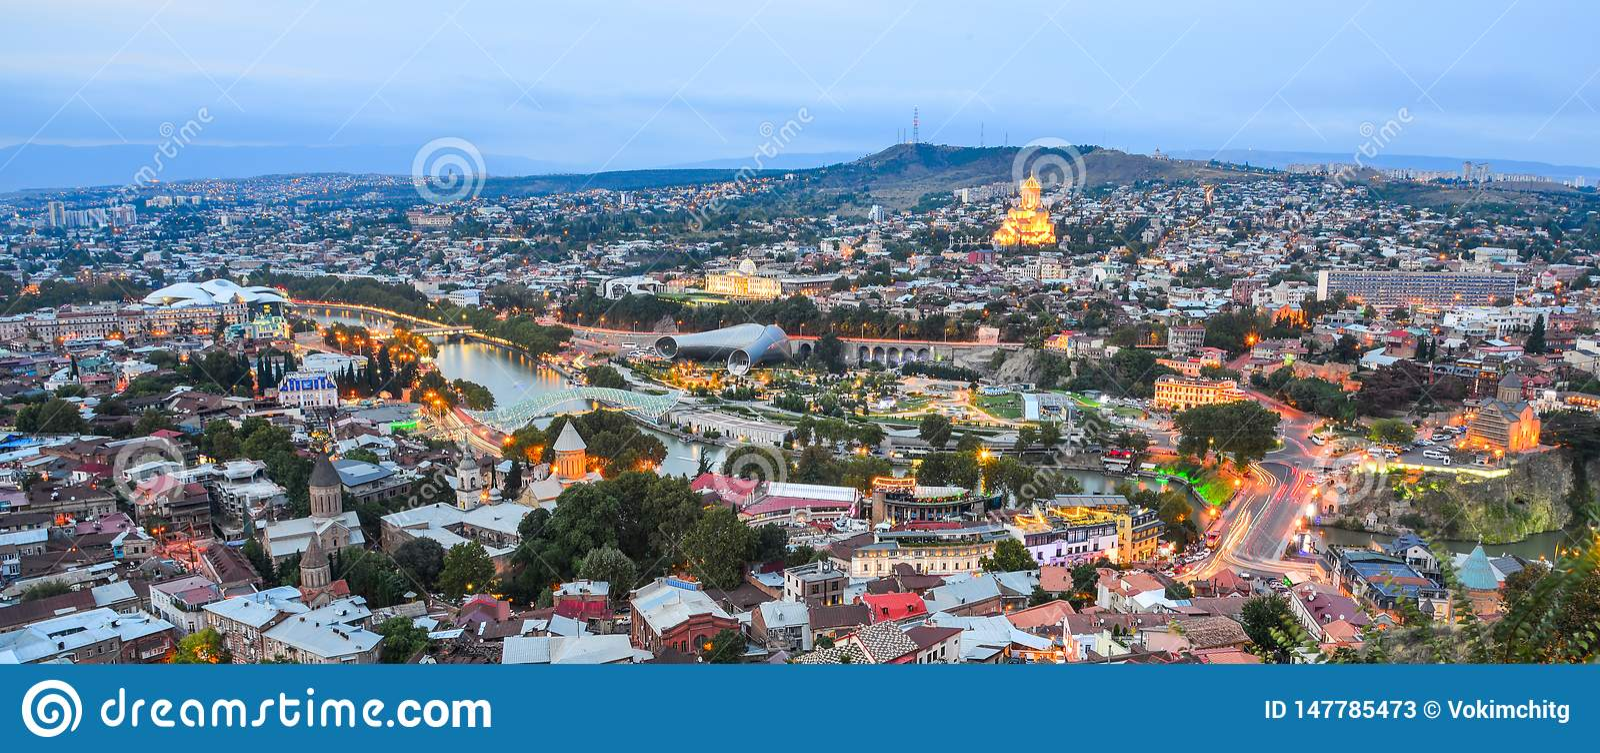 Opini?n de la noche de Tbilisi, Georgia